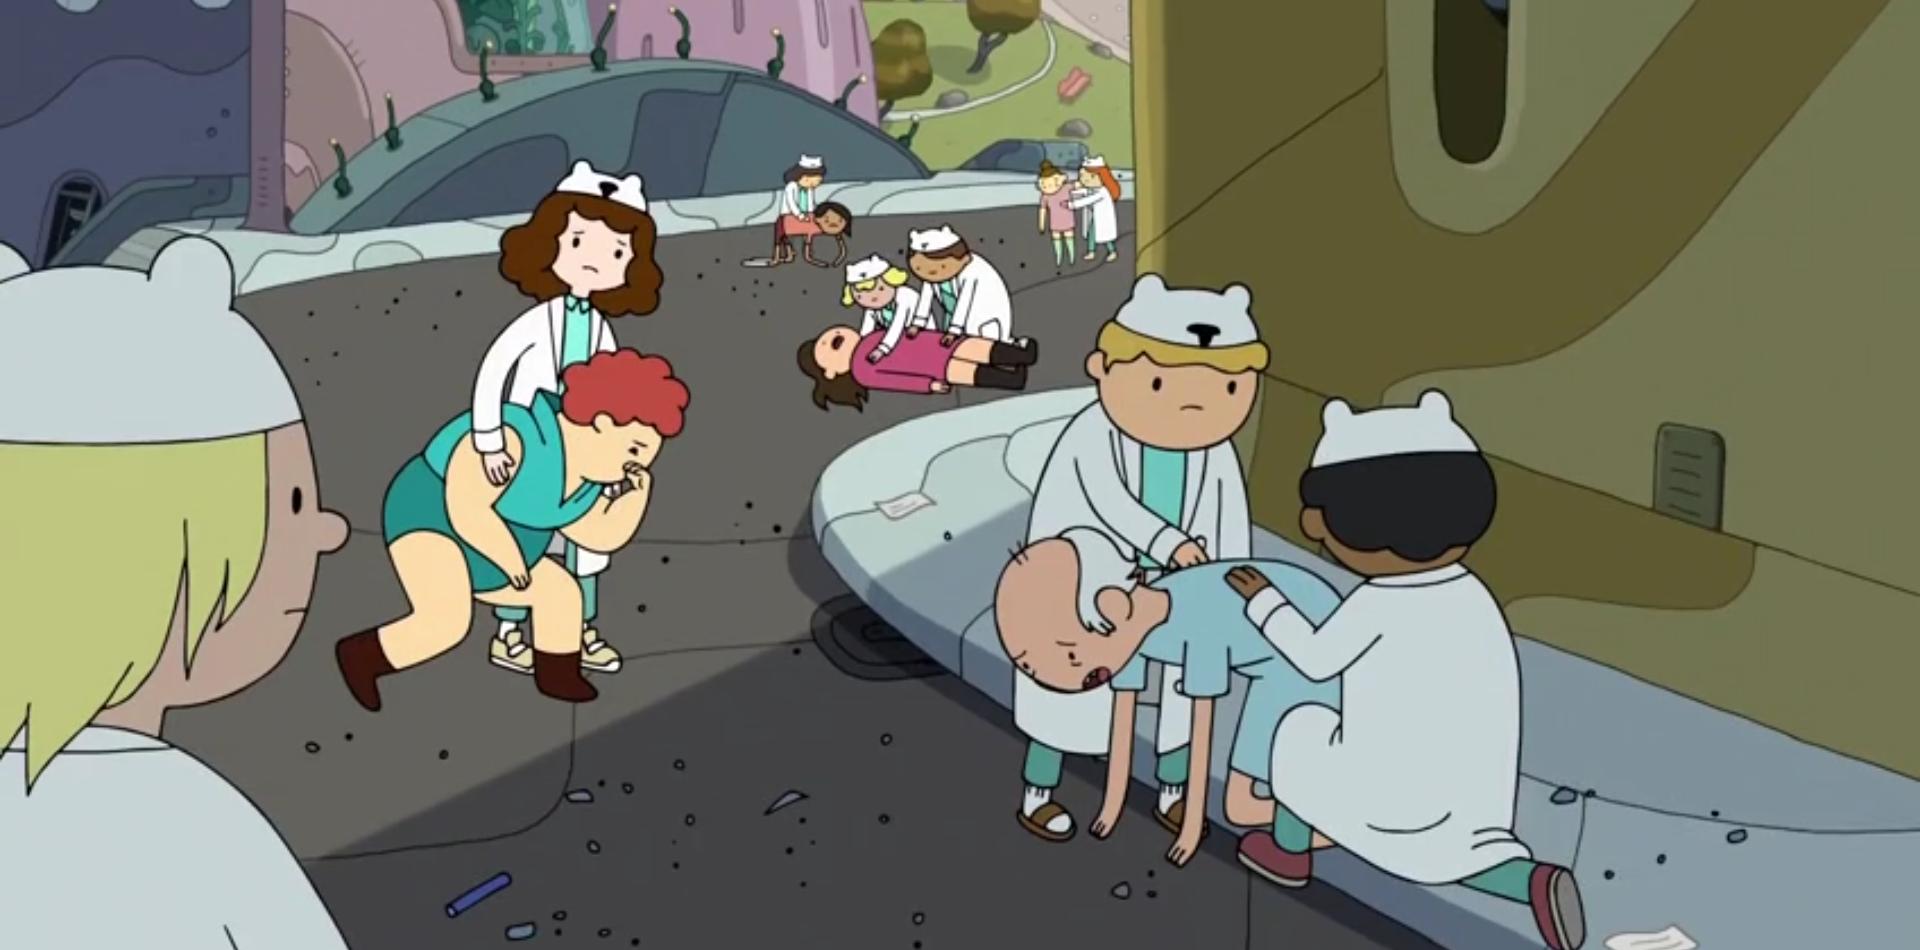 Helpers Adventure Time Wiki Fandom Powered By Wikia